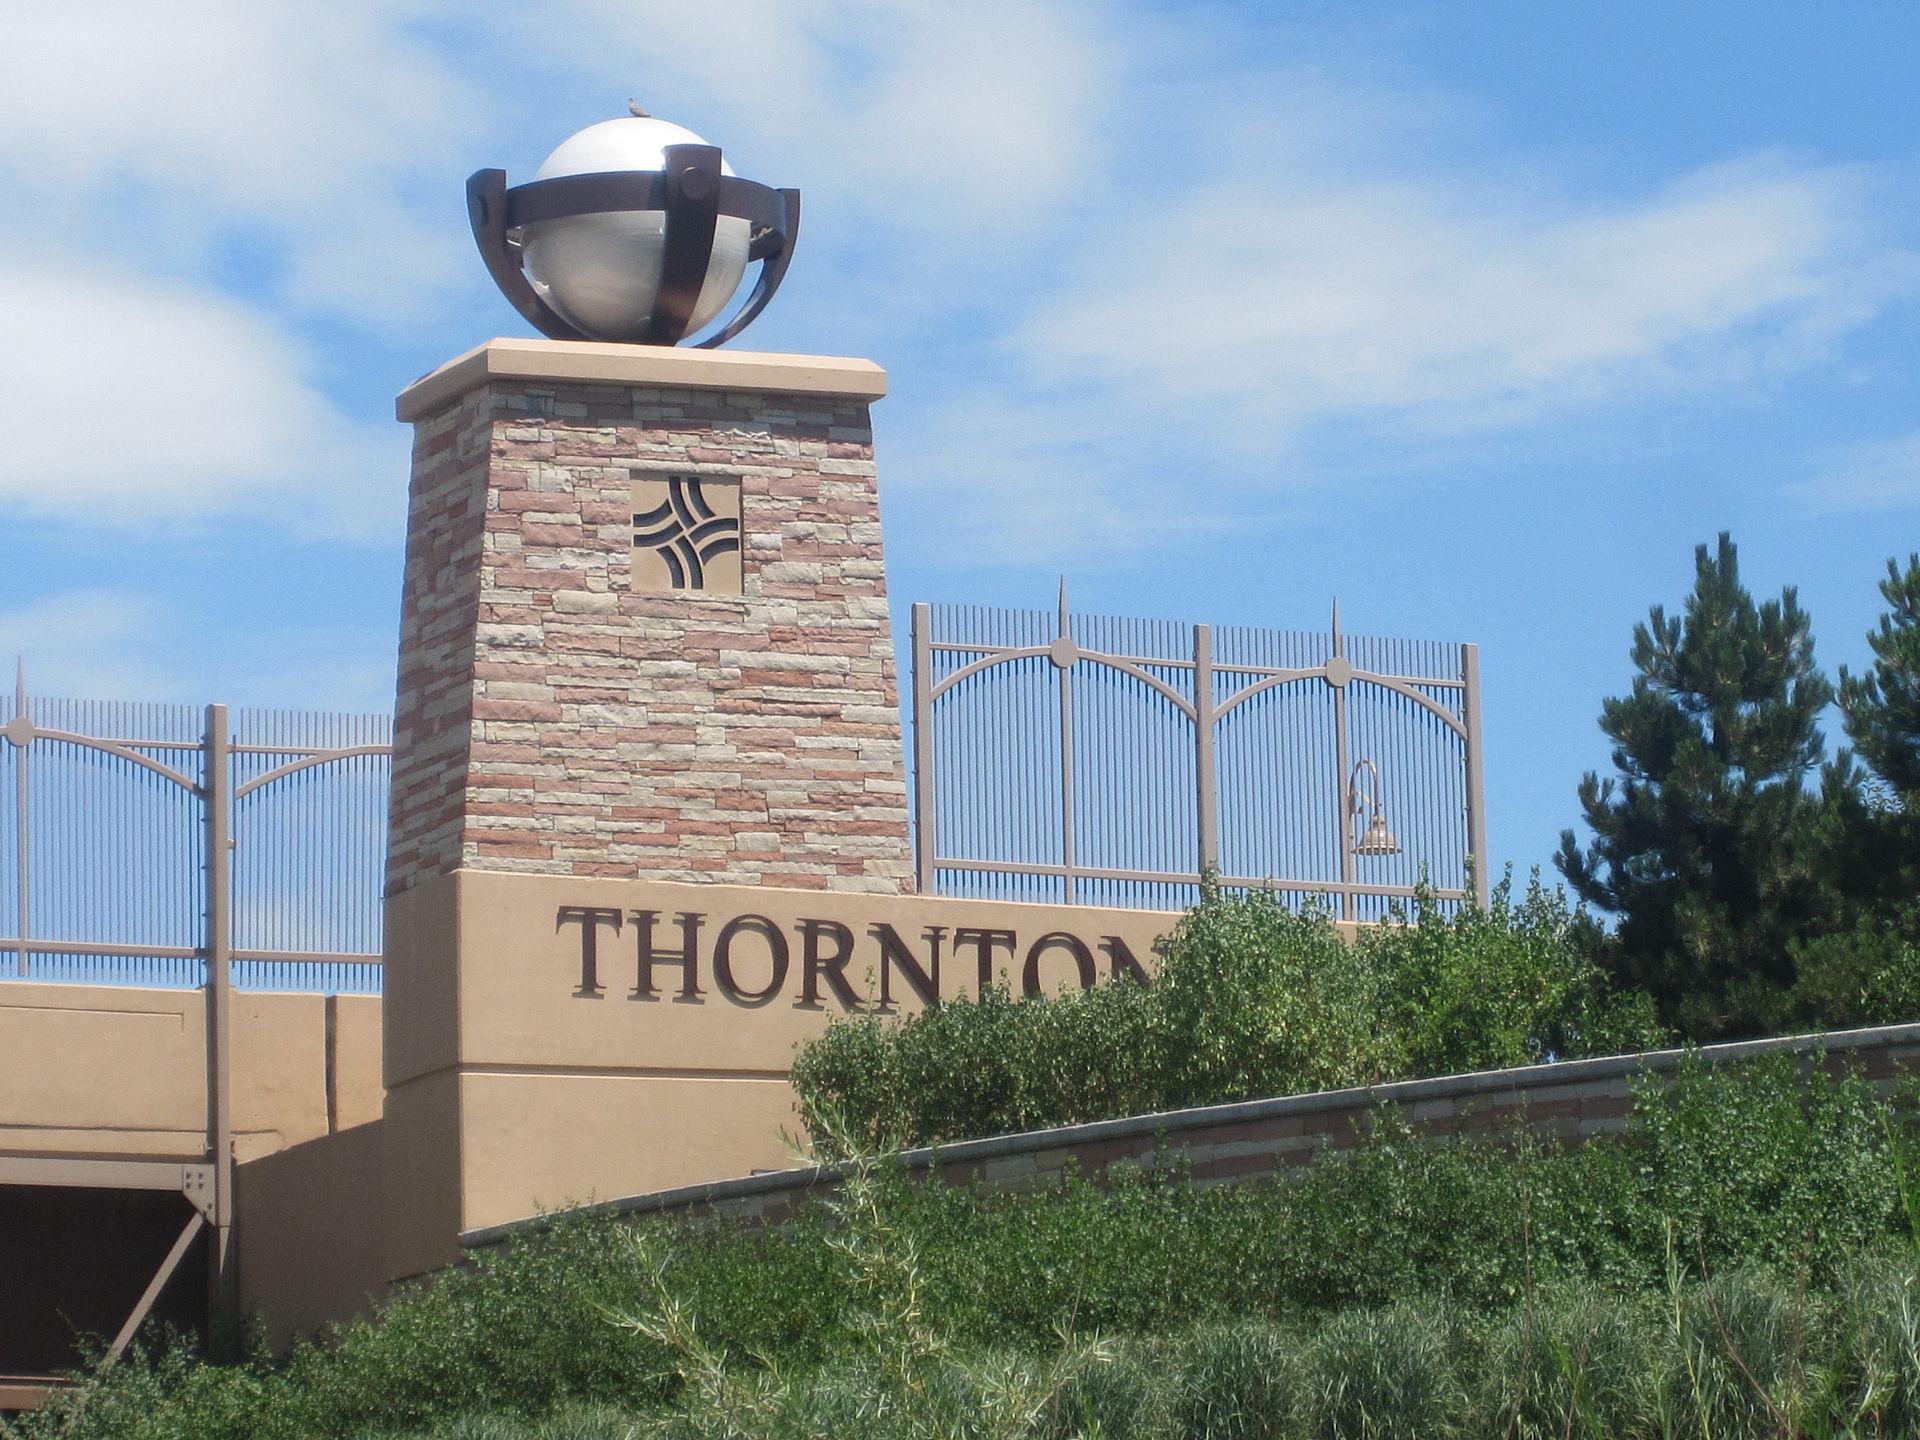 Thornton home warranty